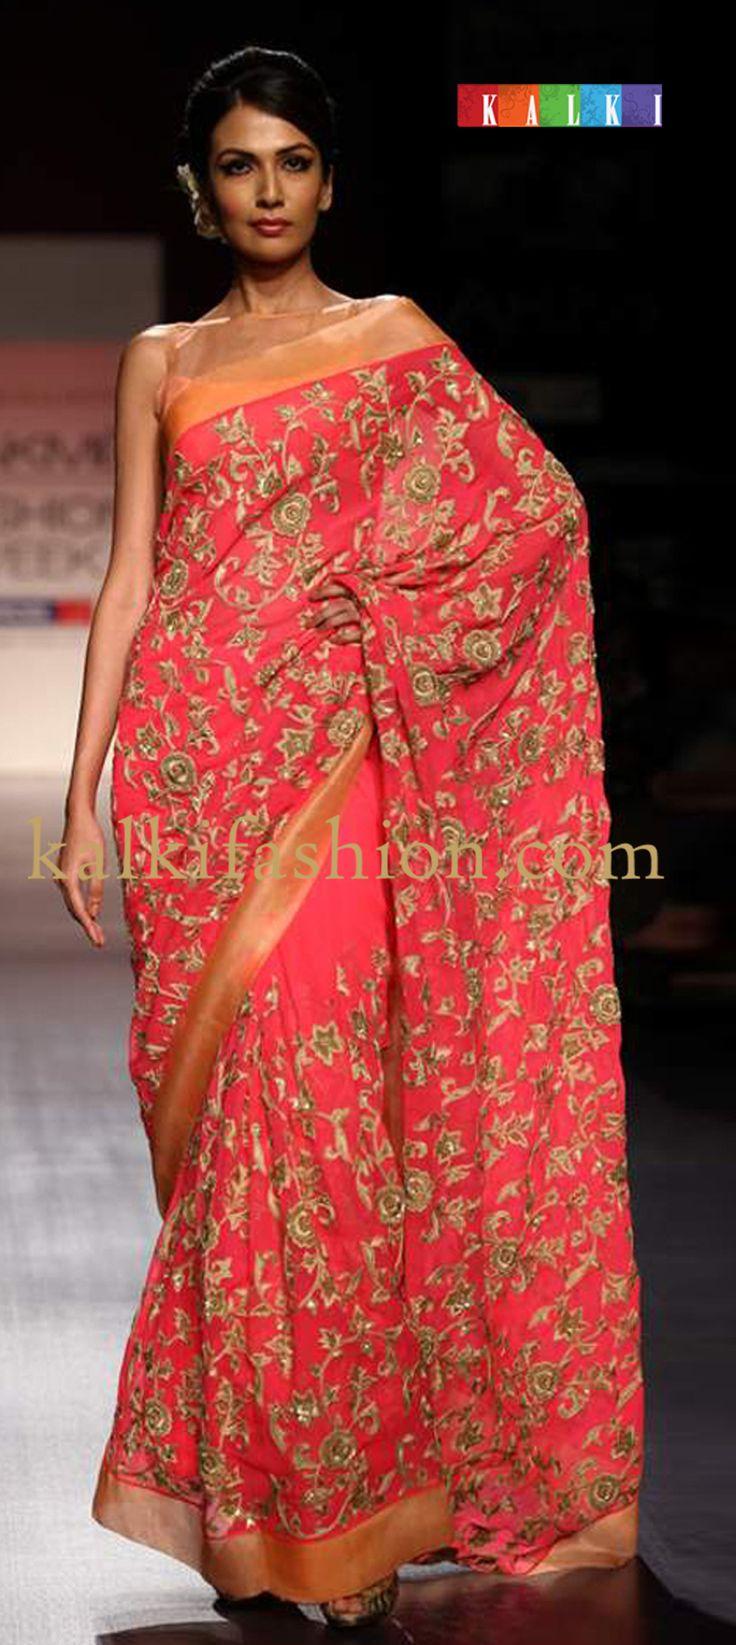 http://www.kalkifashion.com/designers/manish-malhotra.html lakme-fashion-week-2013-collection-by-manish-malhotra